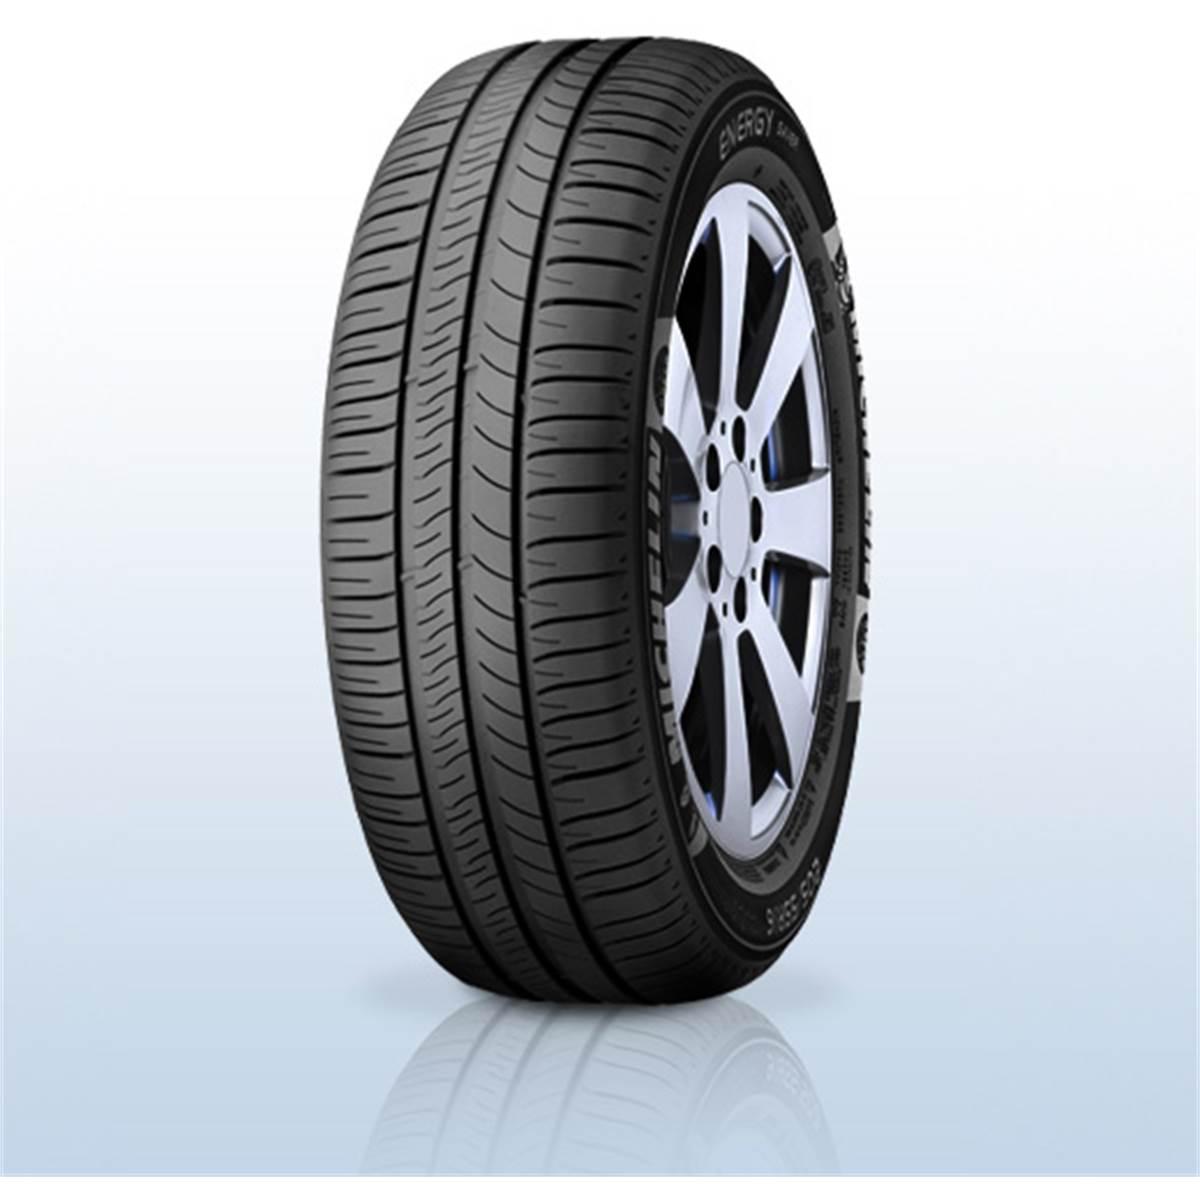 Pneu Michelin 195/55R16 87T Energy Saver +